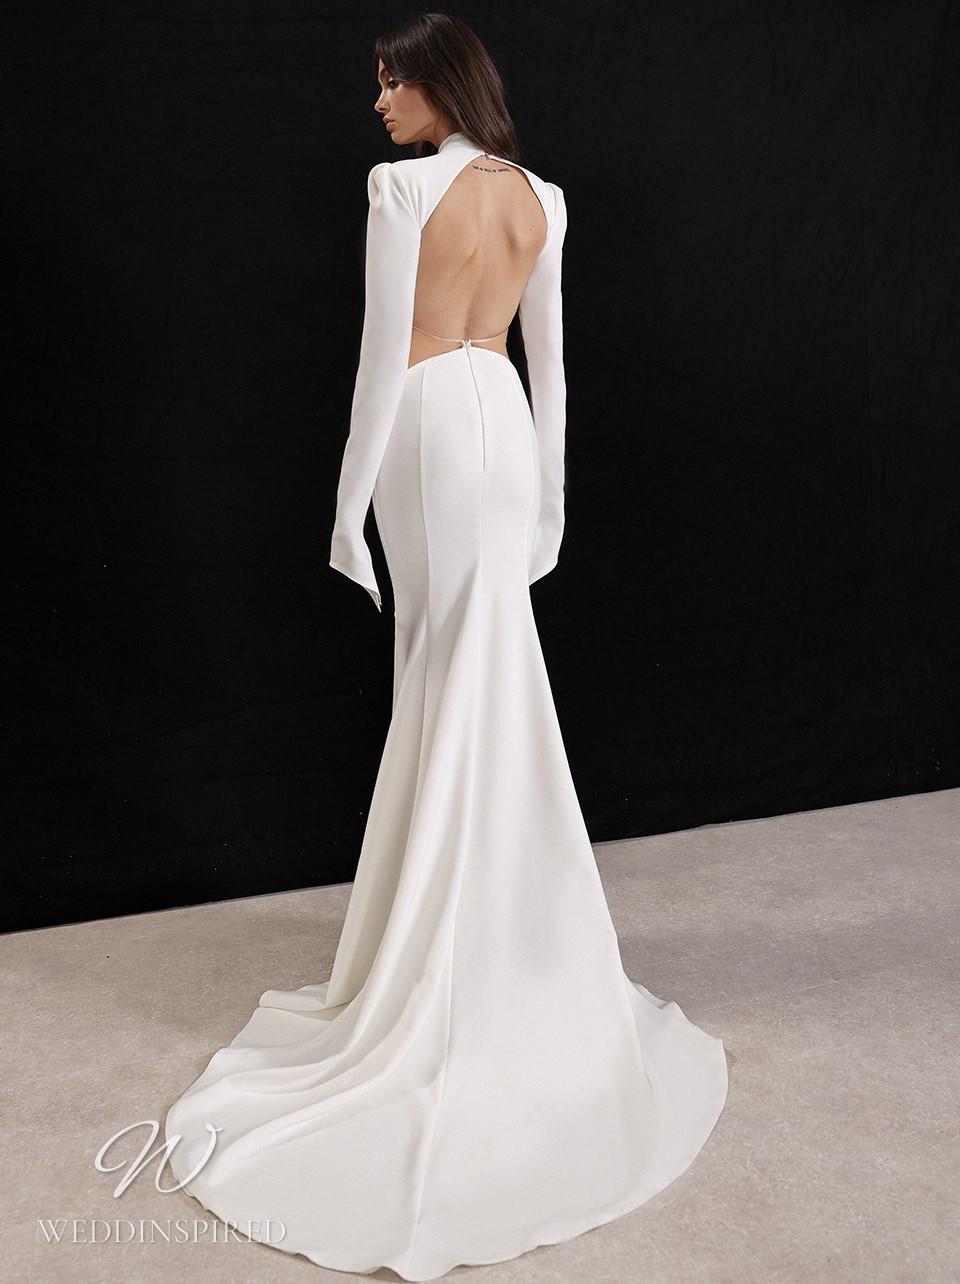 A Galia Lahav 2022 simple mermaid wedding dress with long sleeves and an open back